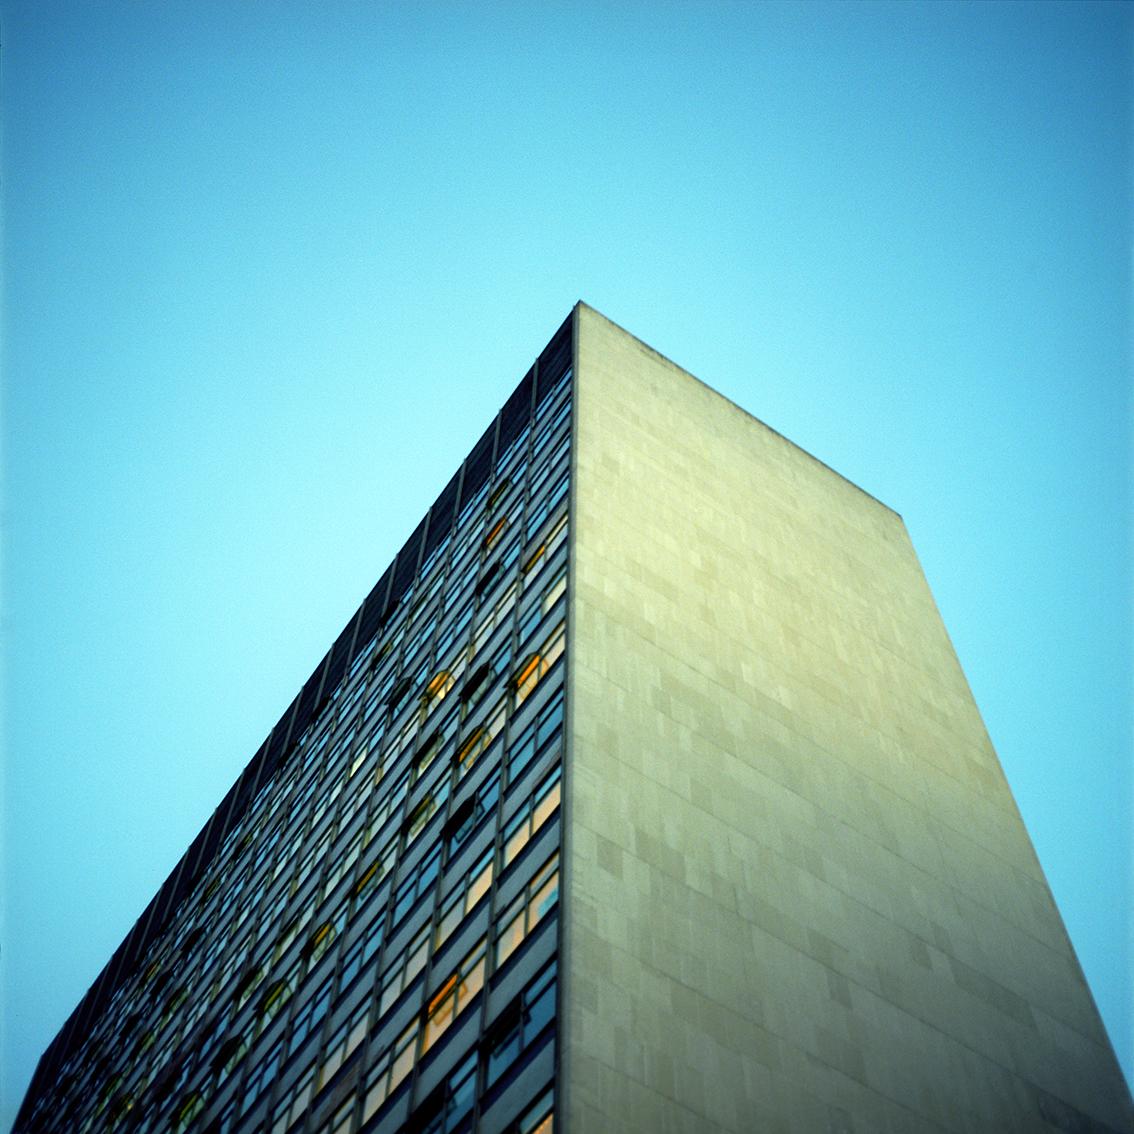 The Tower Building, Waterloo